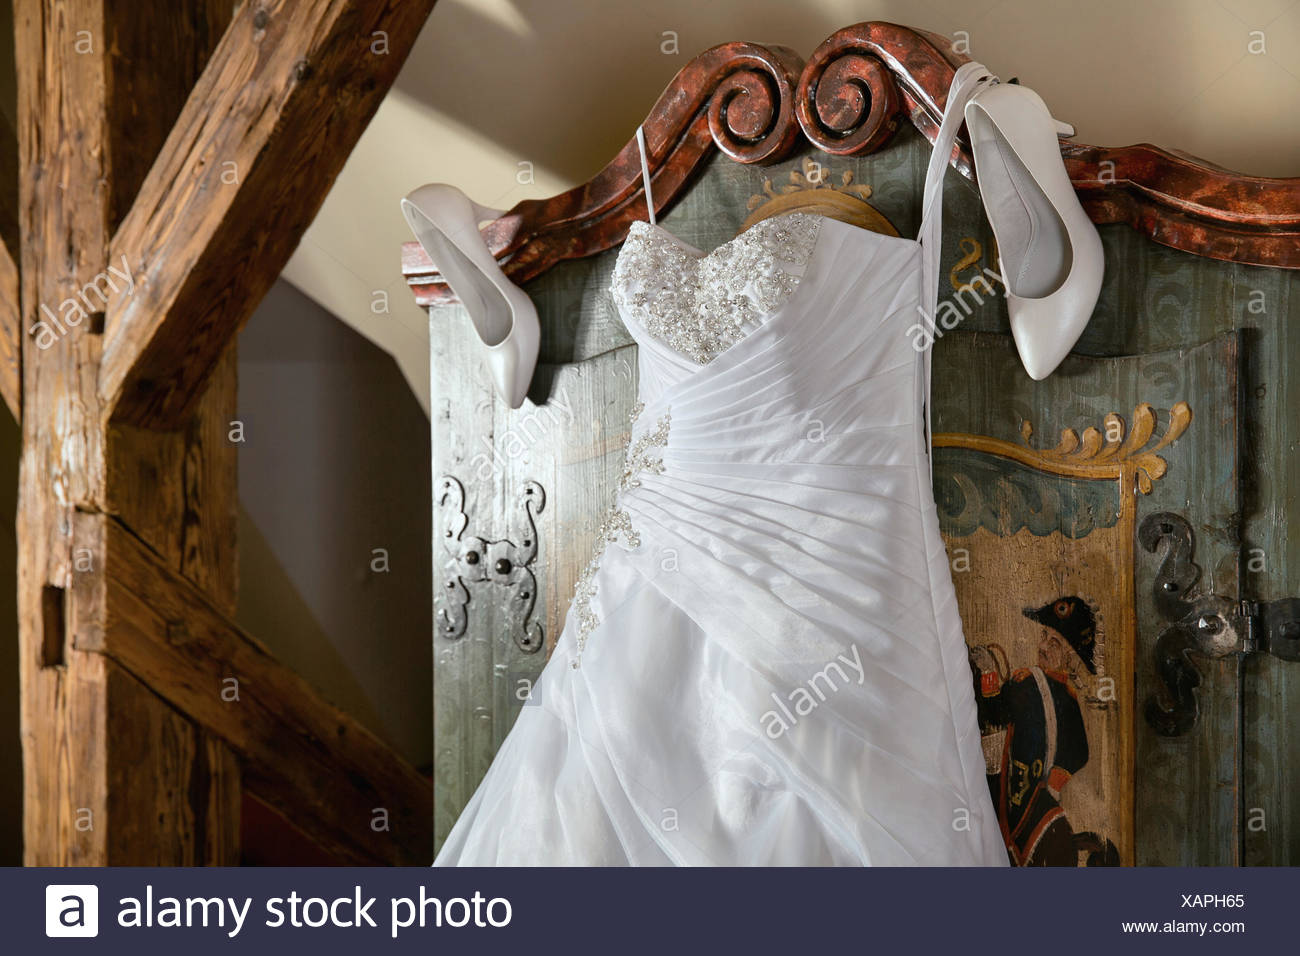 Elegant white wedding dress with boots - Stock Image